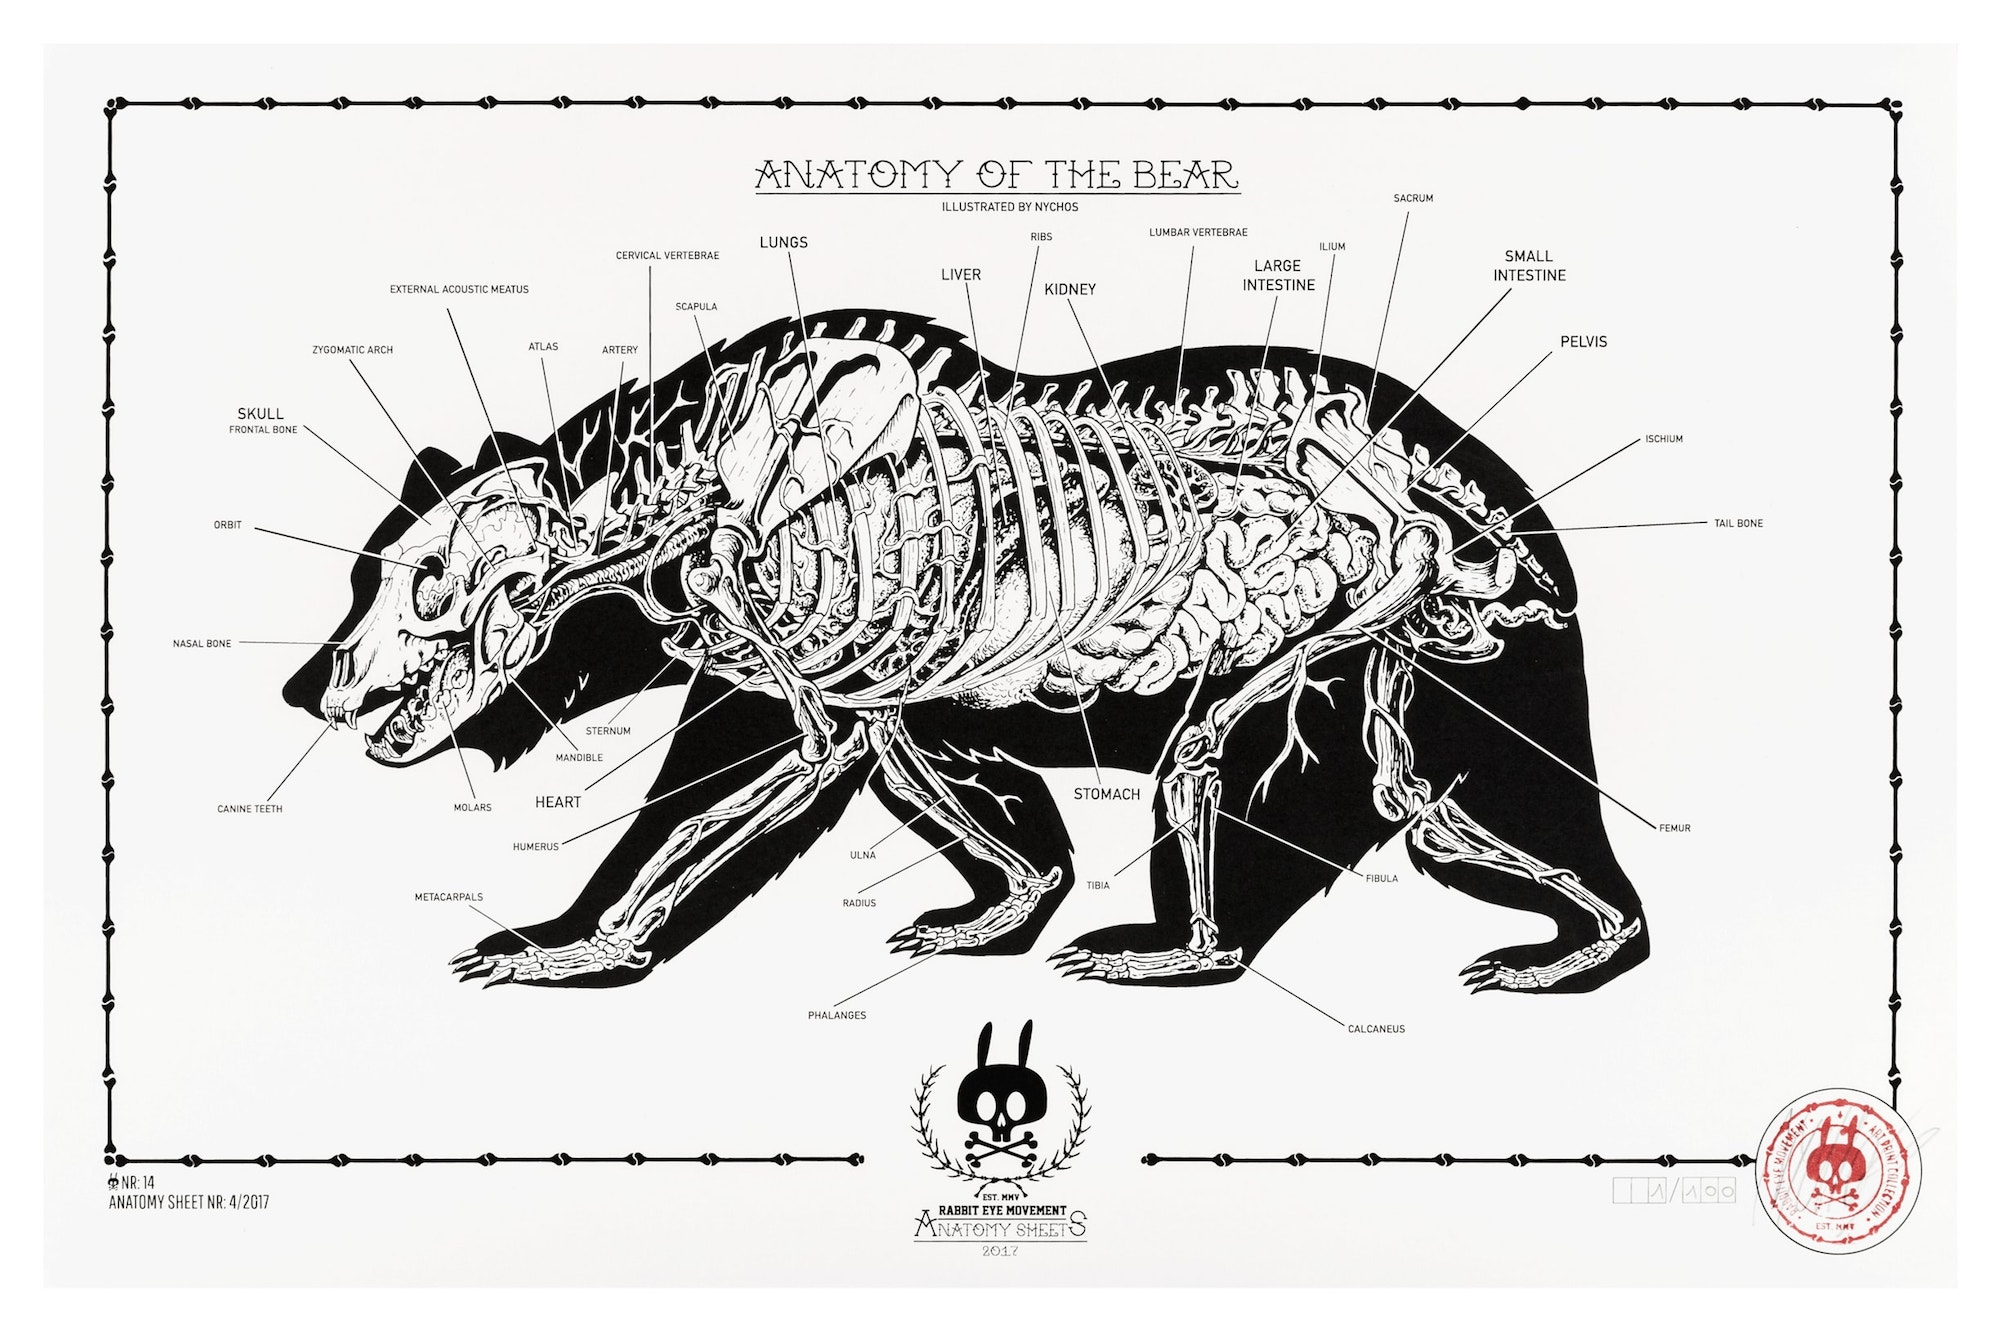 Anatomy Of The Bear Anatomy Sheet No 14